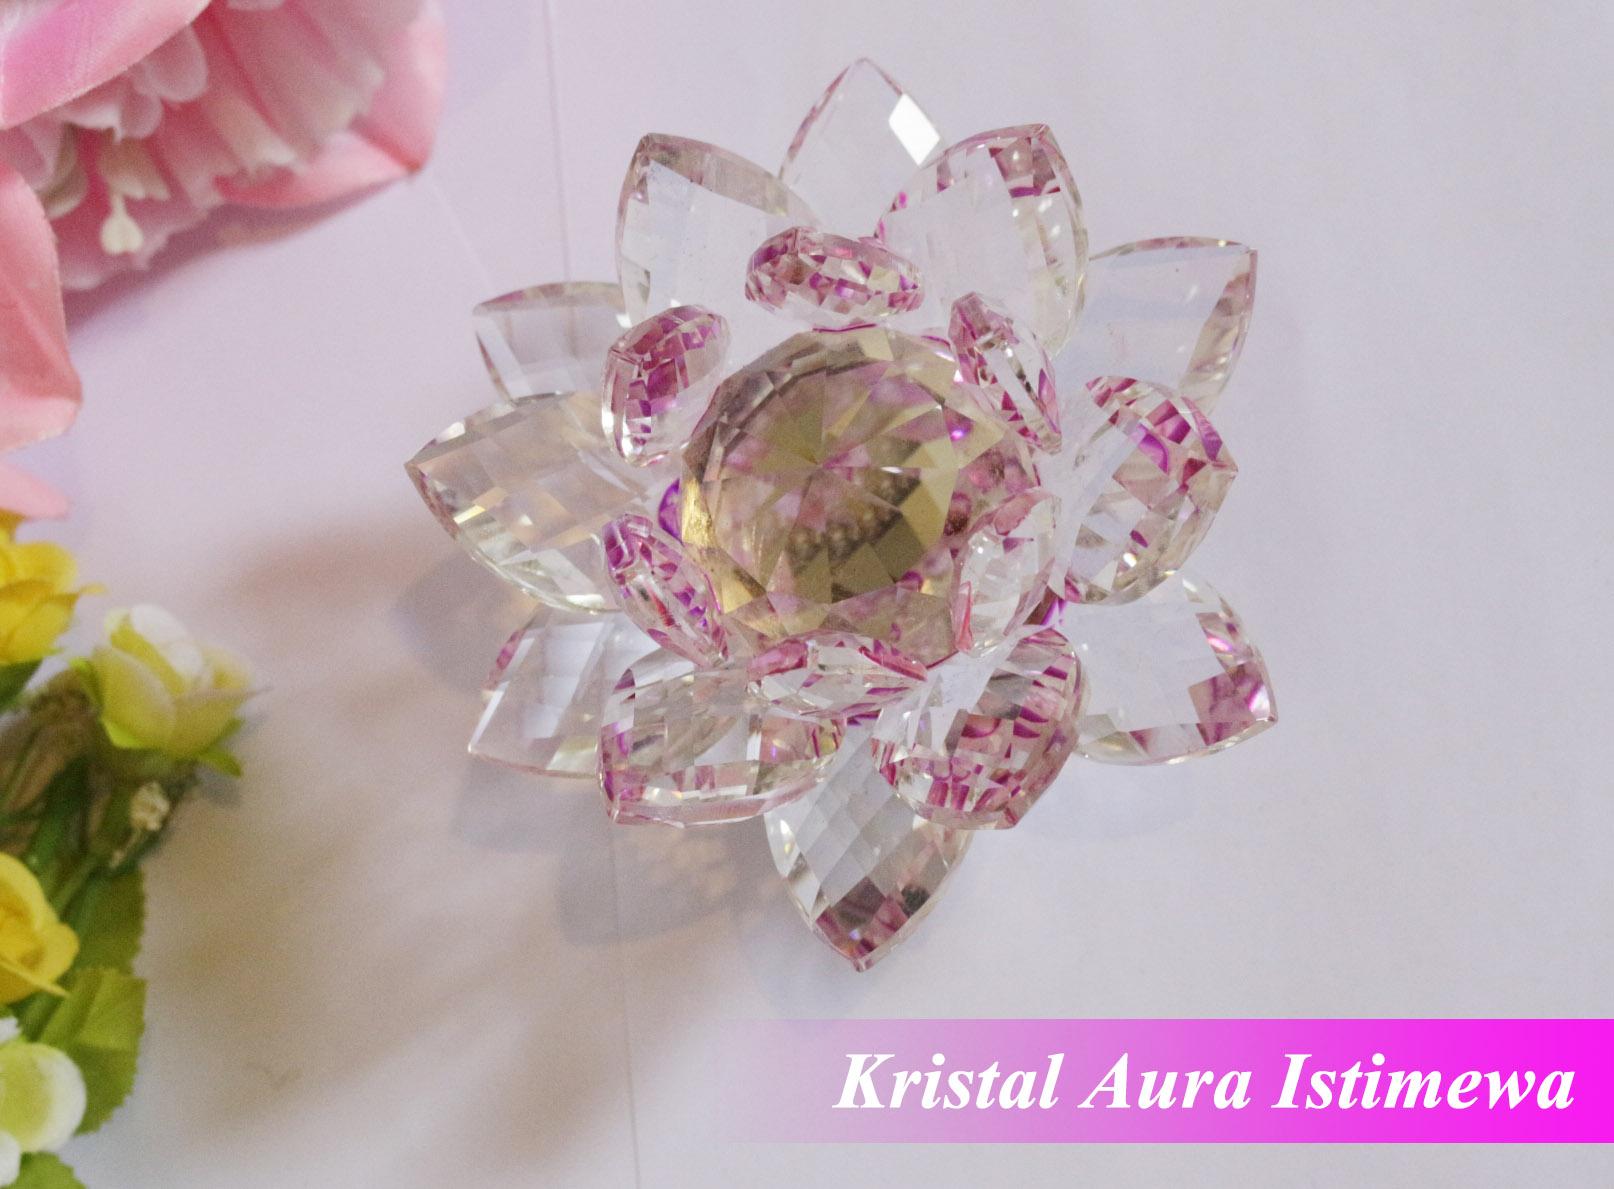 kristal-aura